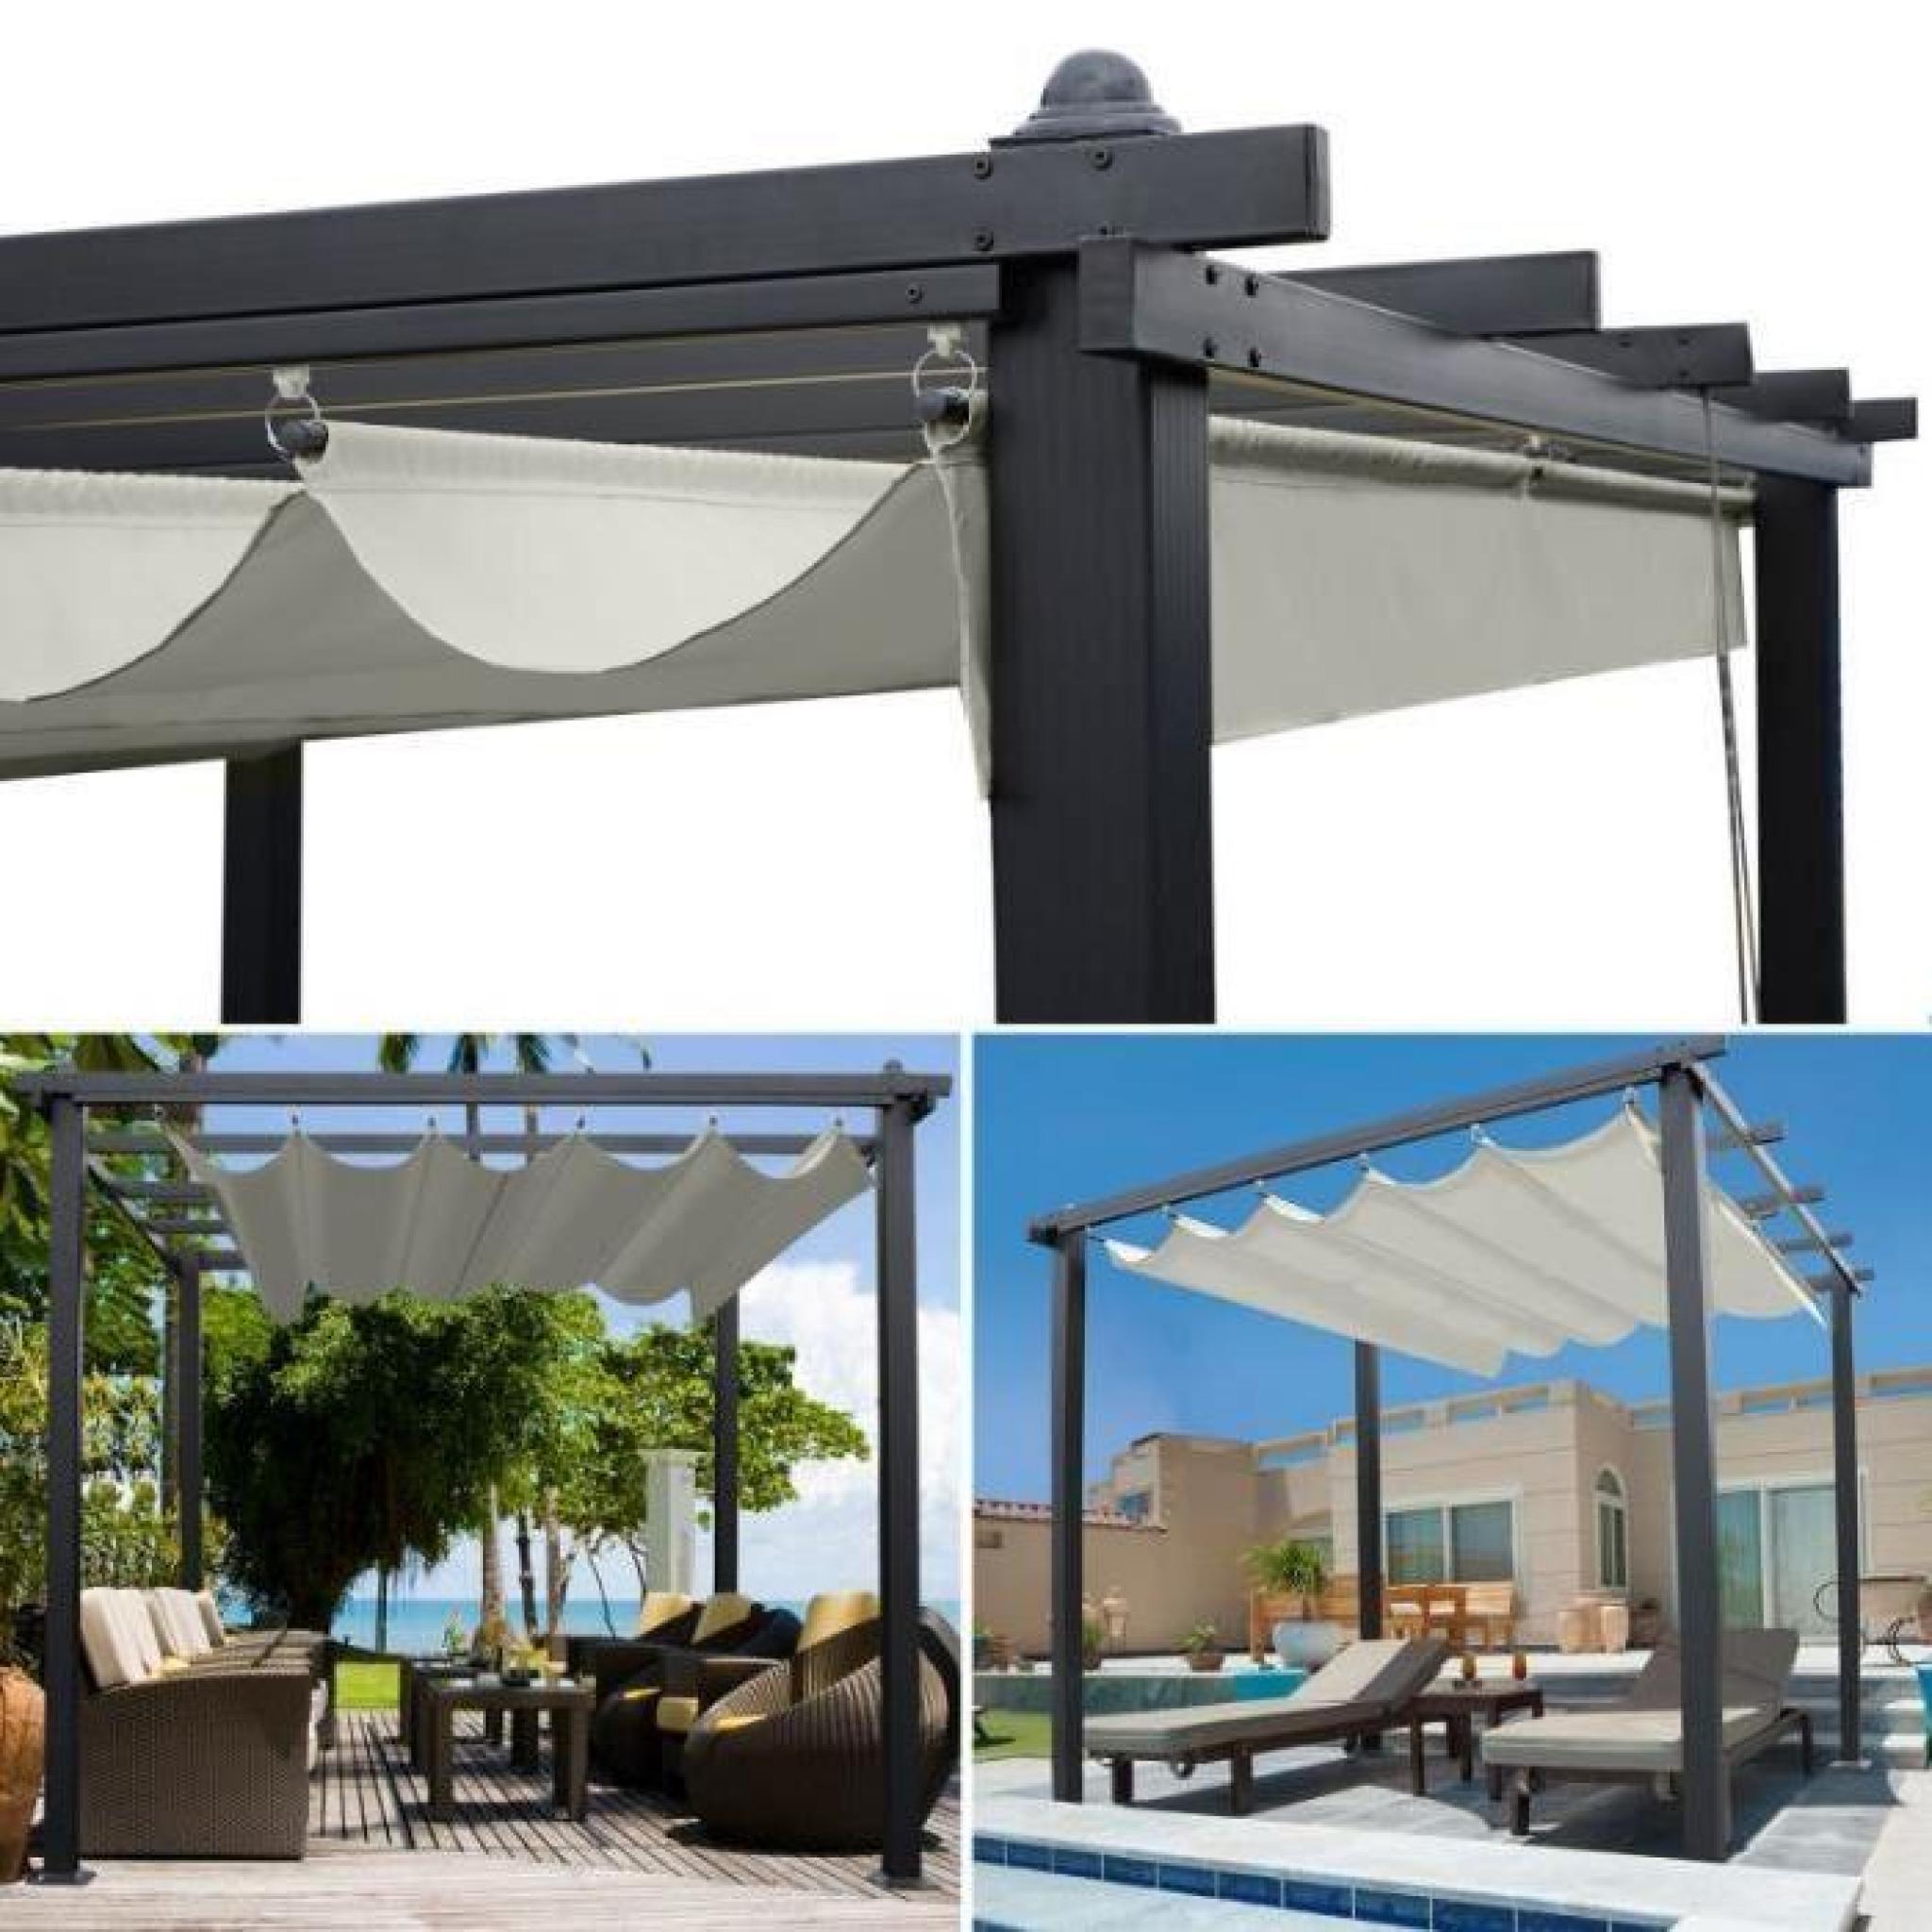 pergola toit r tractable crue tonnelle 4 pieds 3x3m achat vente pergola en aluminium pas cher. Black Bedroom Furniture Sets. Home Design Ideas